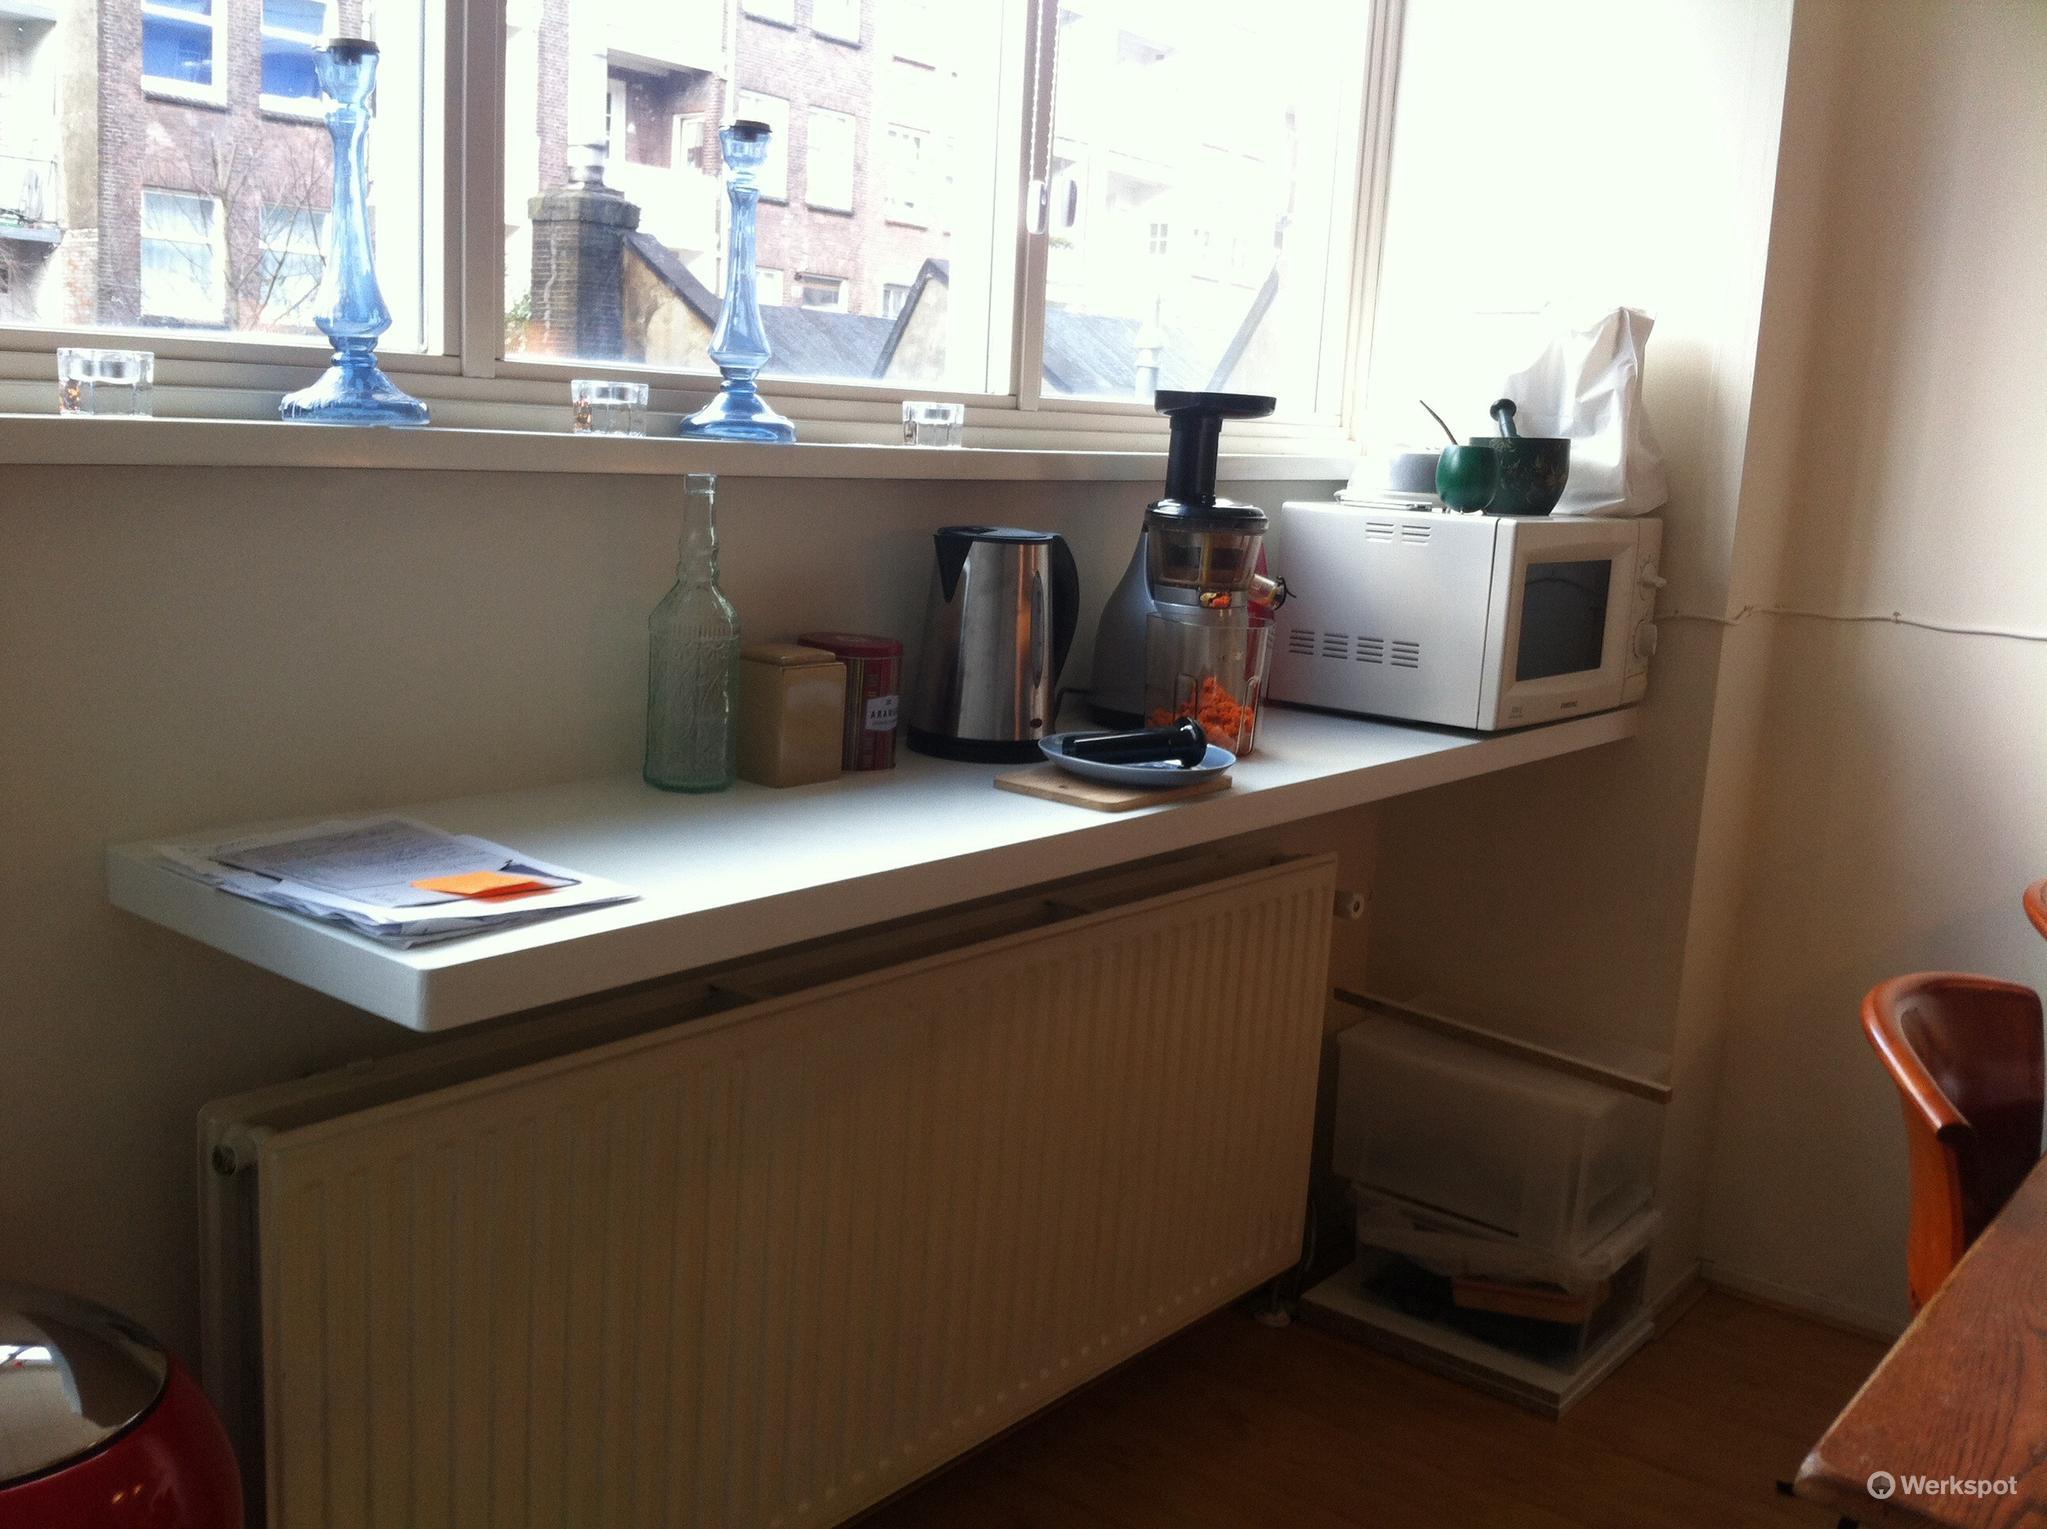 Extra Werkblad Keuken : Keukenkastjes bureau tafel en extra werkblad keuken alle op